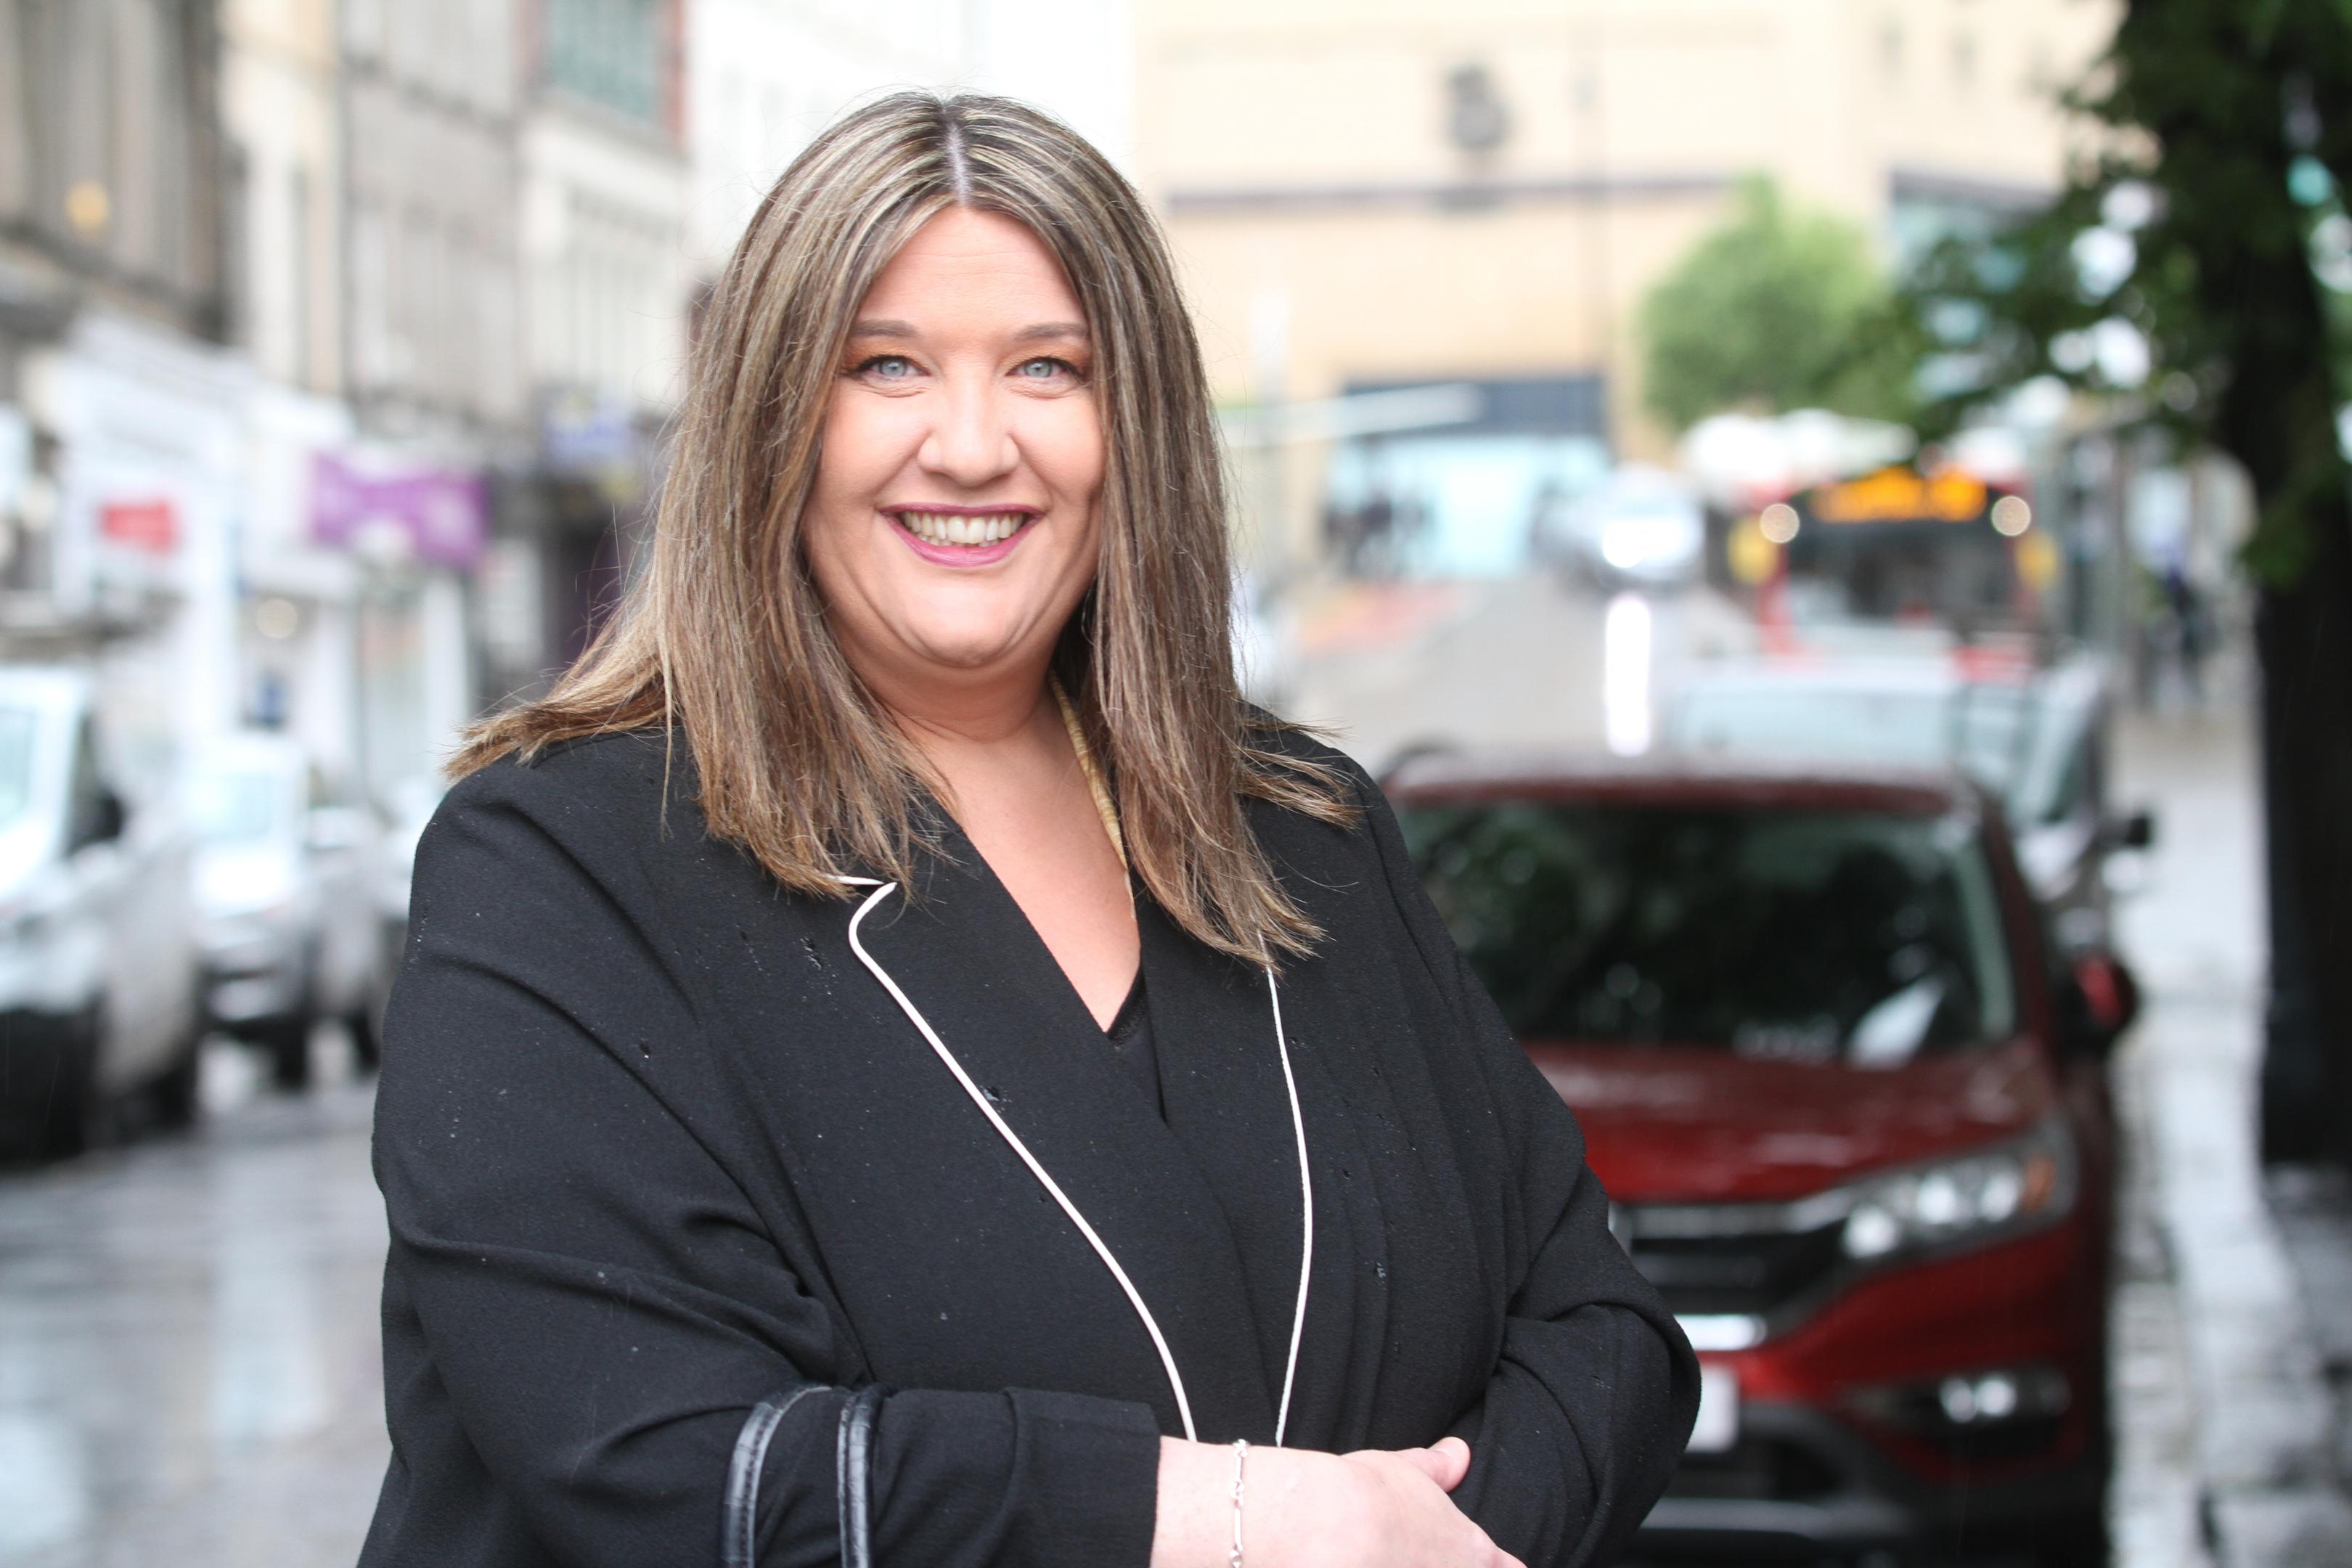 Dundee City Council's city centre manager Sarah Craig.